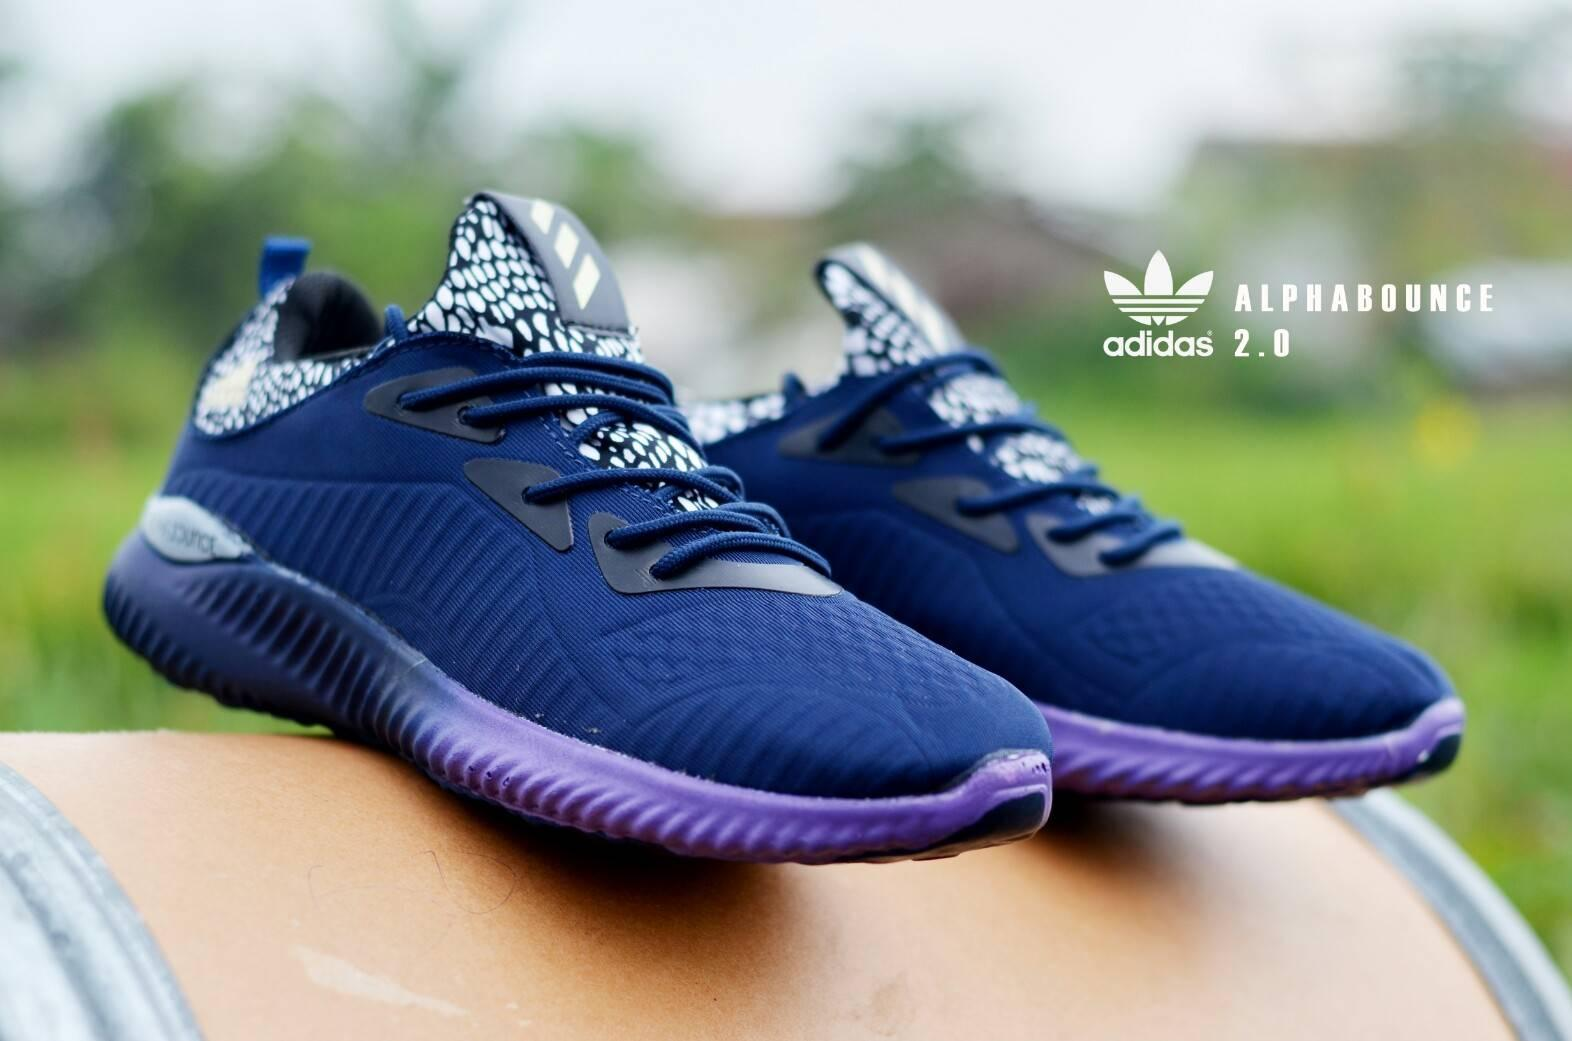 Sepatu Olahraga sport adidas alphabounce pria wanita jogging outdoor lari  santai gym senam runing terbaik murah 32f330e73e